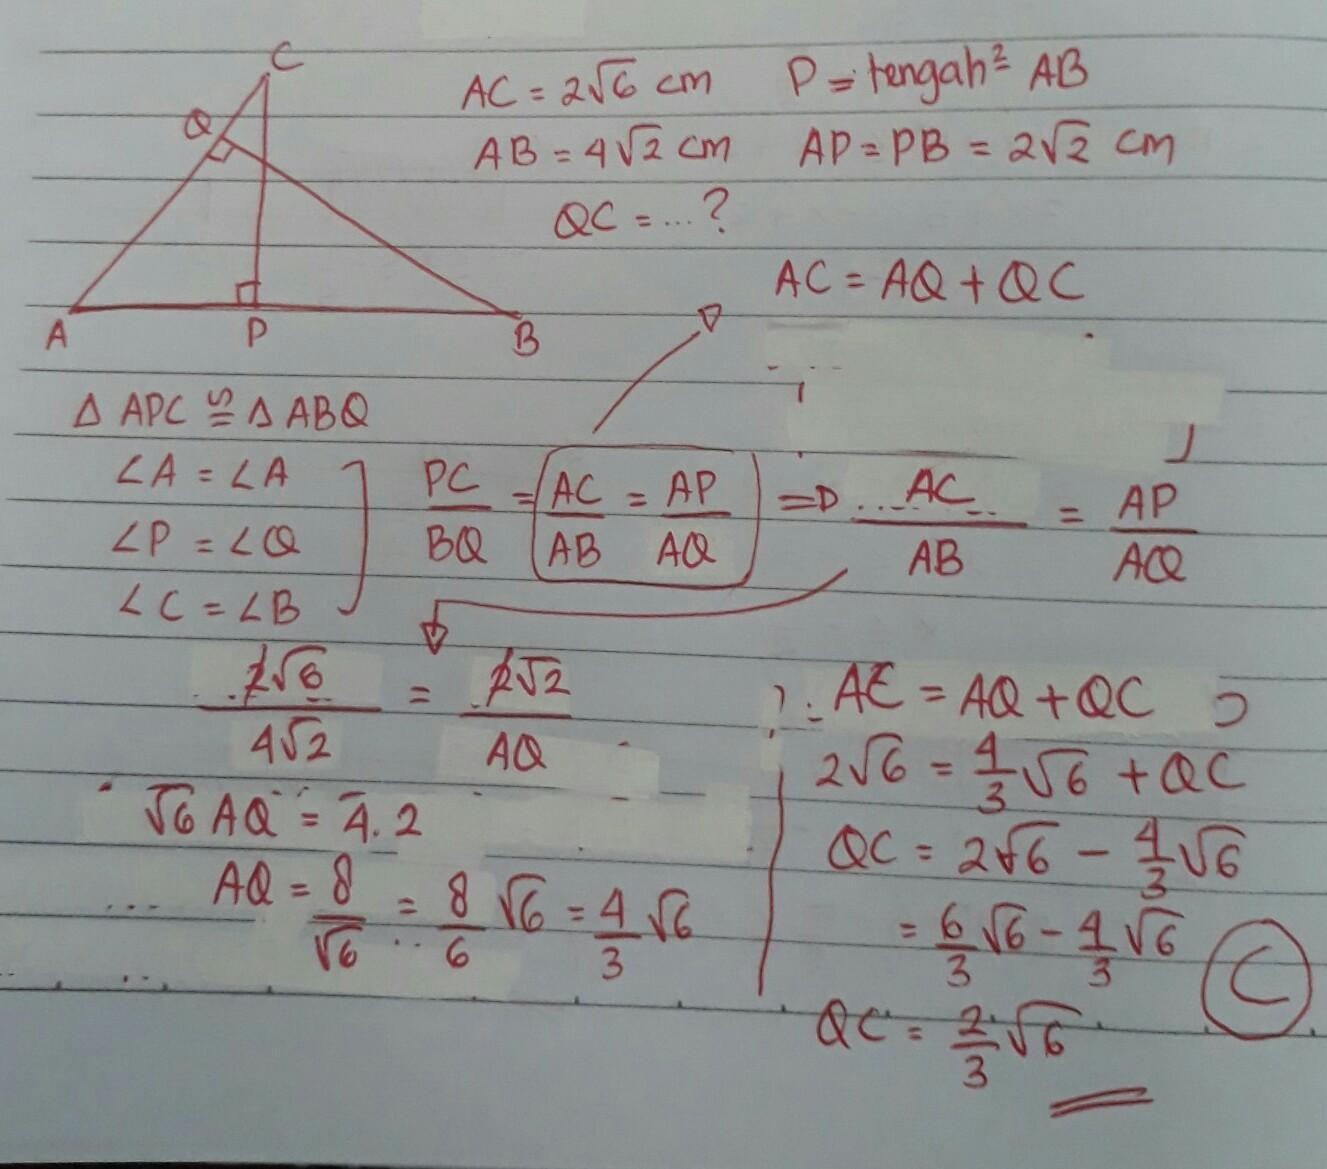 Perhatikan gambar dibawah ini. Misalkan AC = 2√6 cm dan AB ...